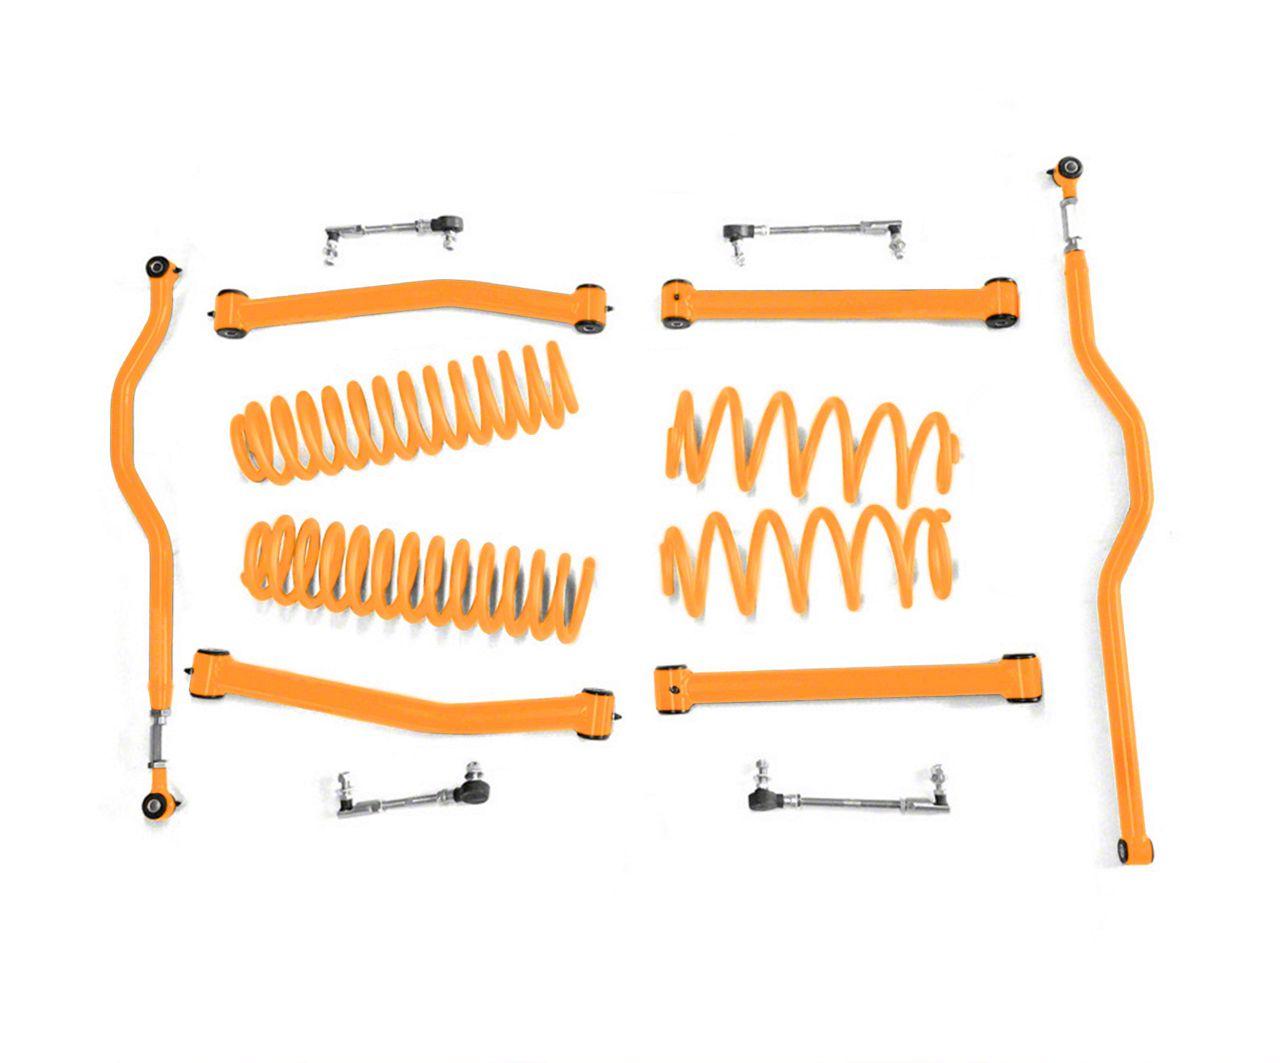 Steinjager 2.5 in. Expanded Lift Kit for Right Hand Drive - Fluorescent Orange (07-18 Jeep Wrangler JK)